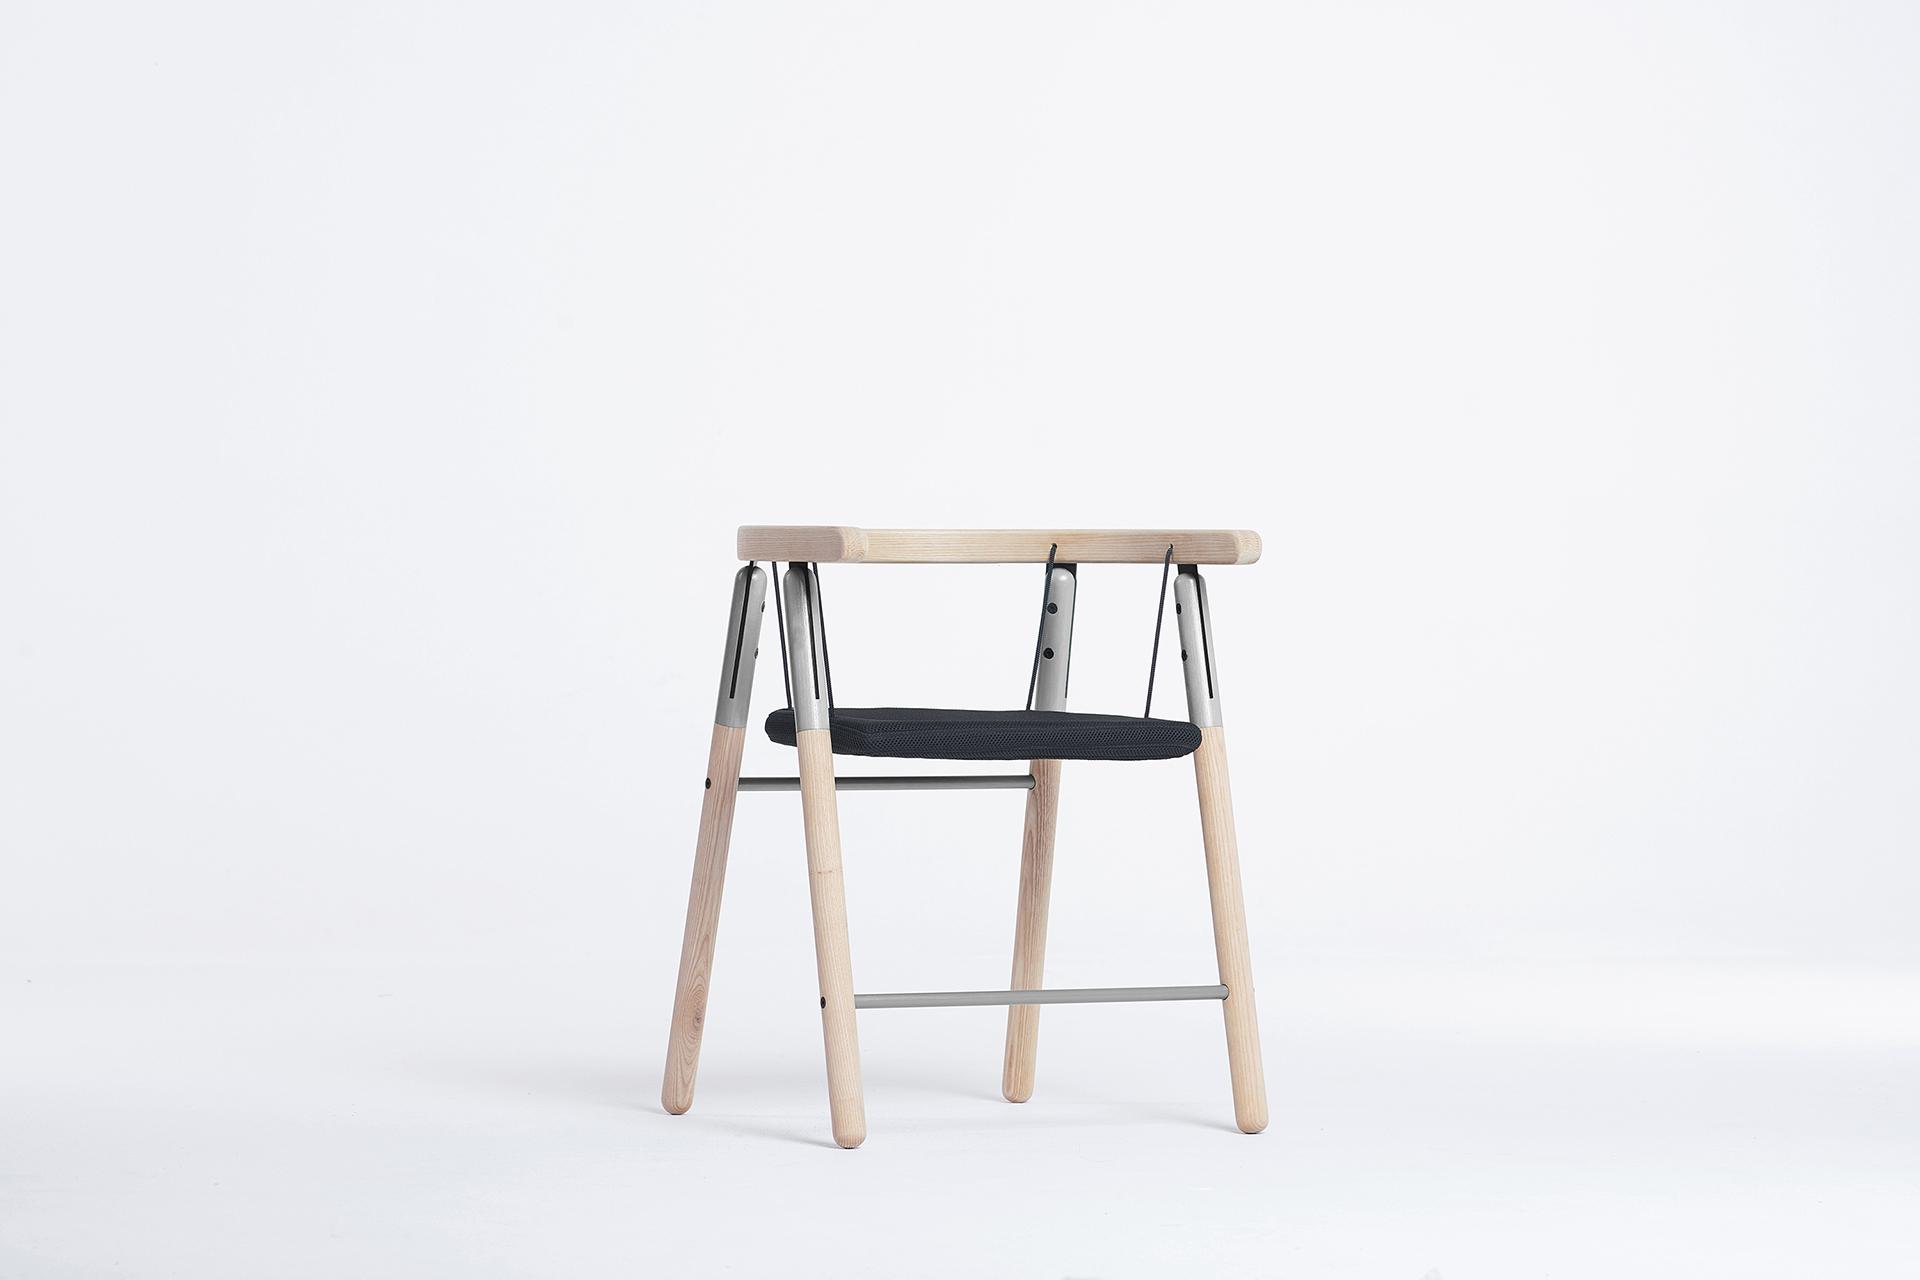 Tink Things sensory furniture 3 (Photo by Marija Gasparovic).jpg